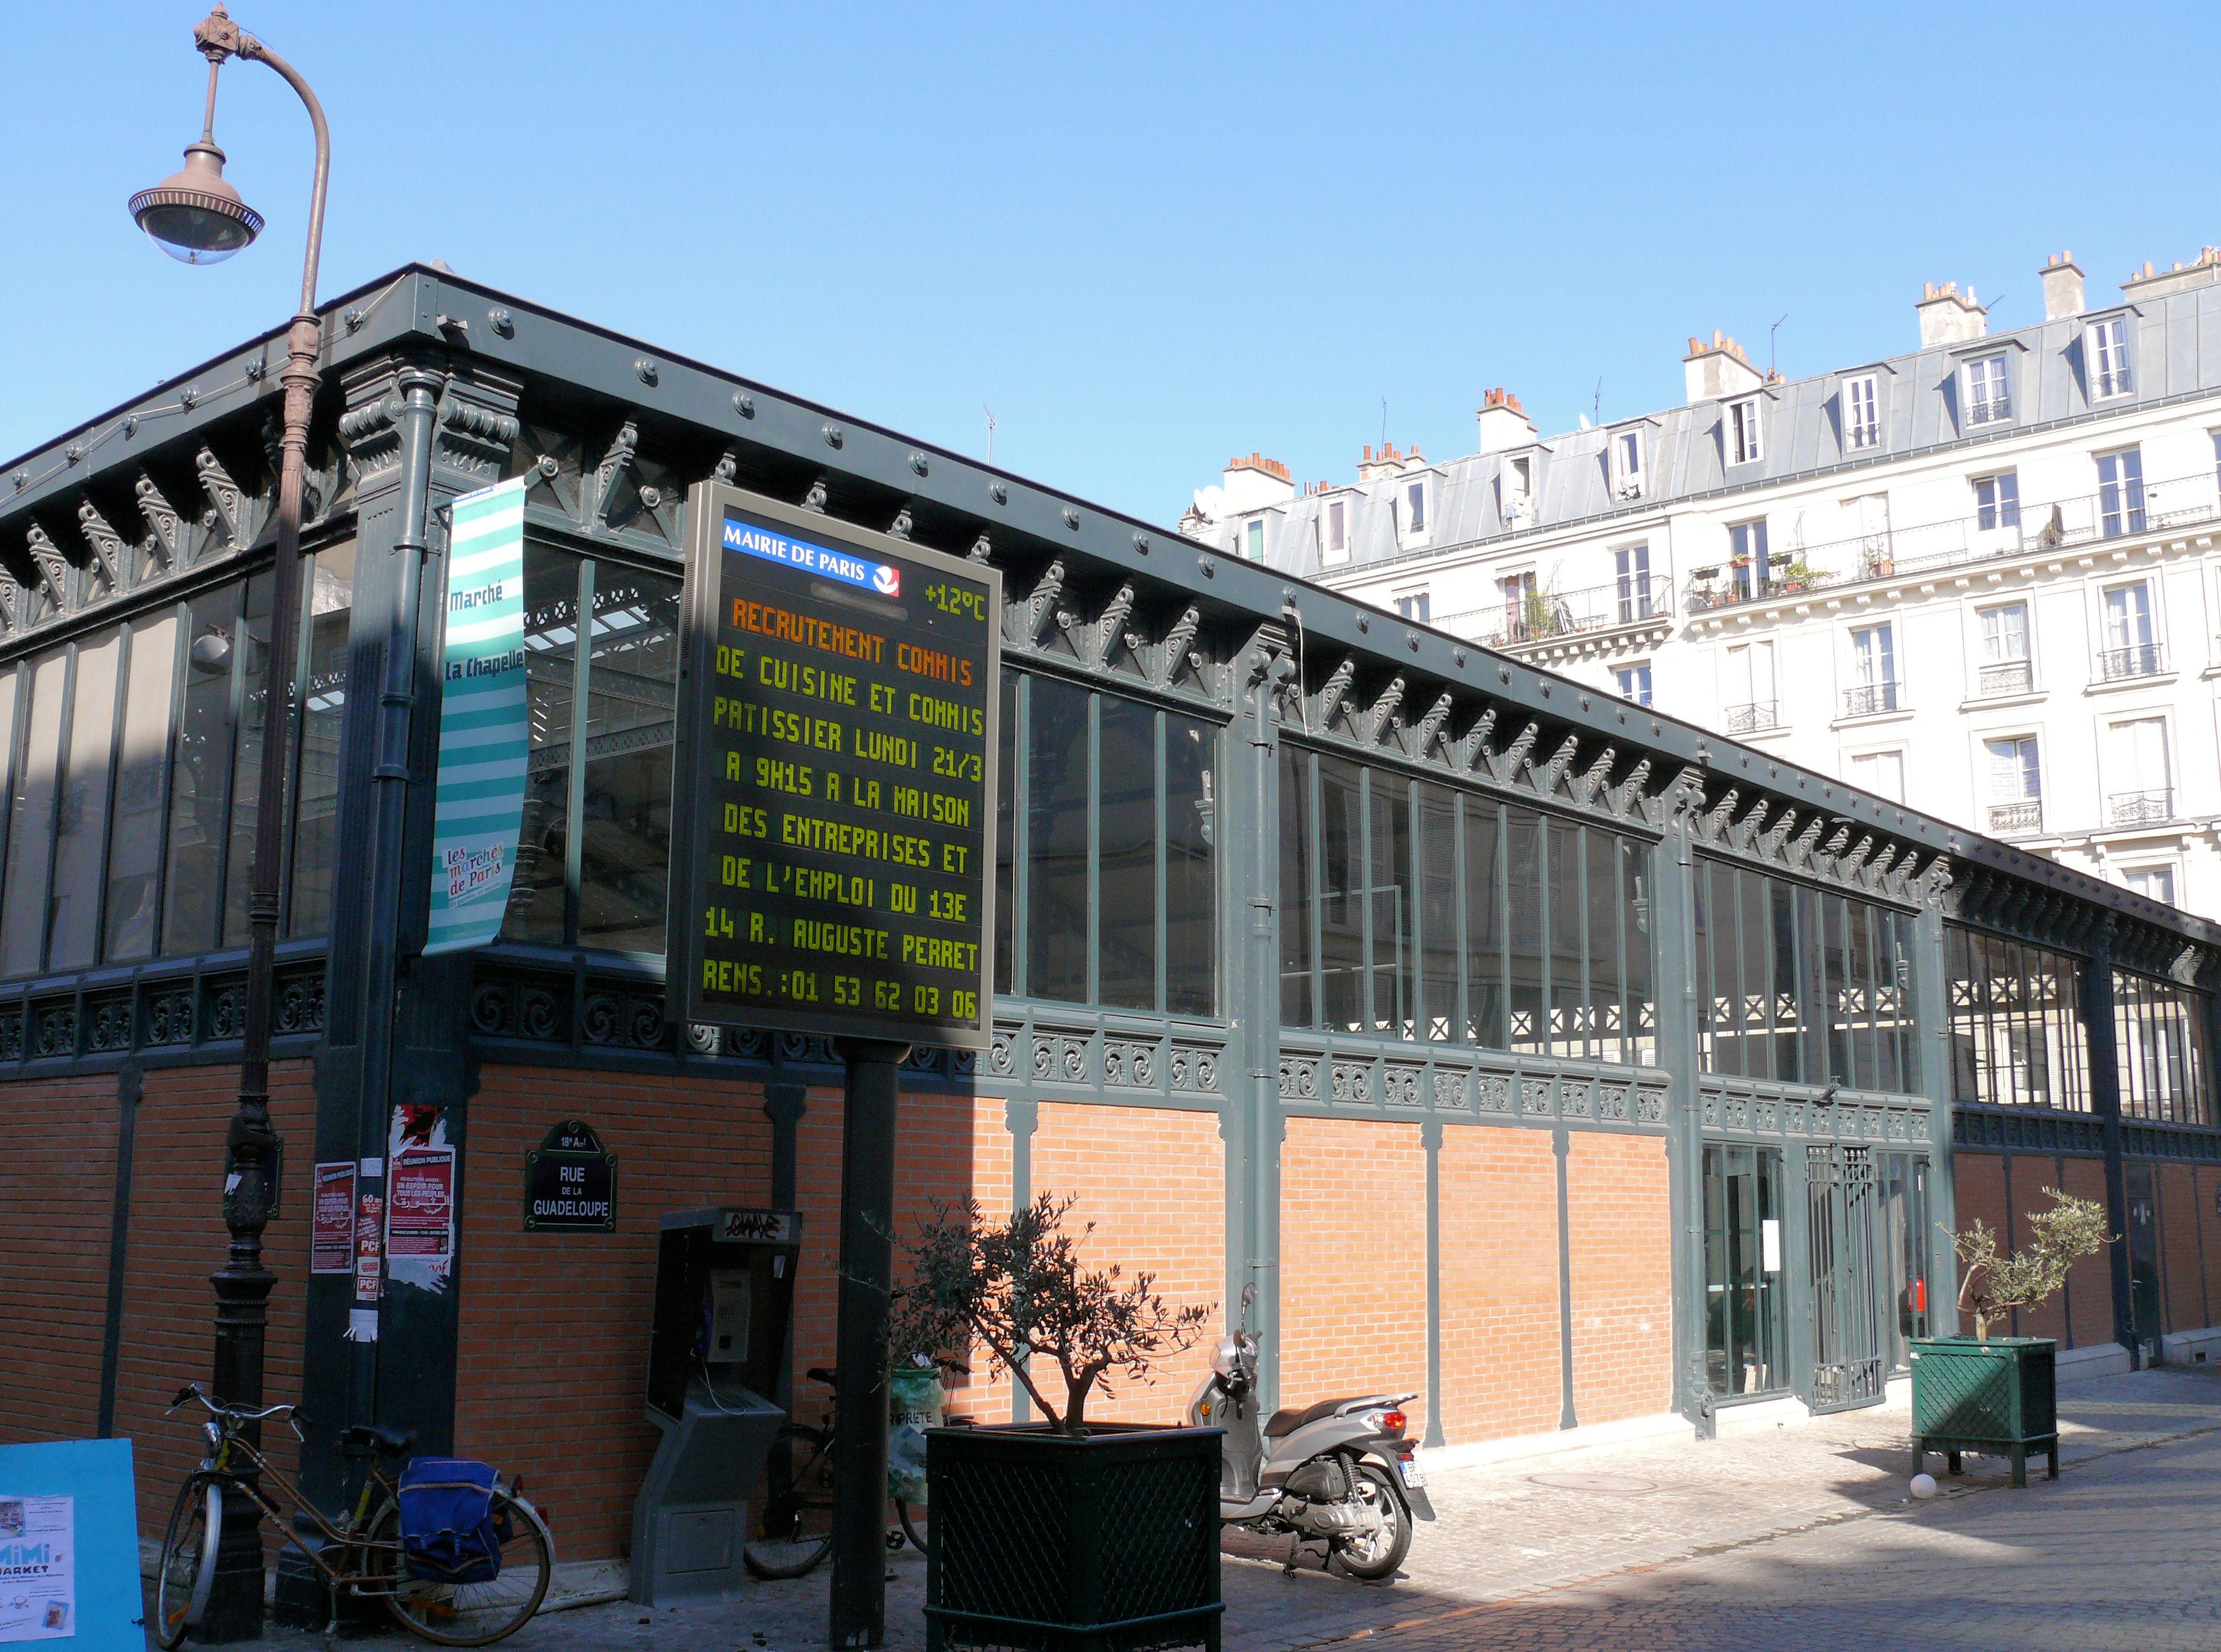 Rencontre Cougar Reims